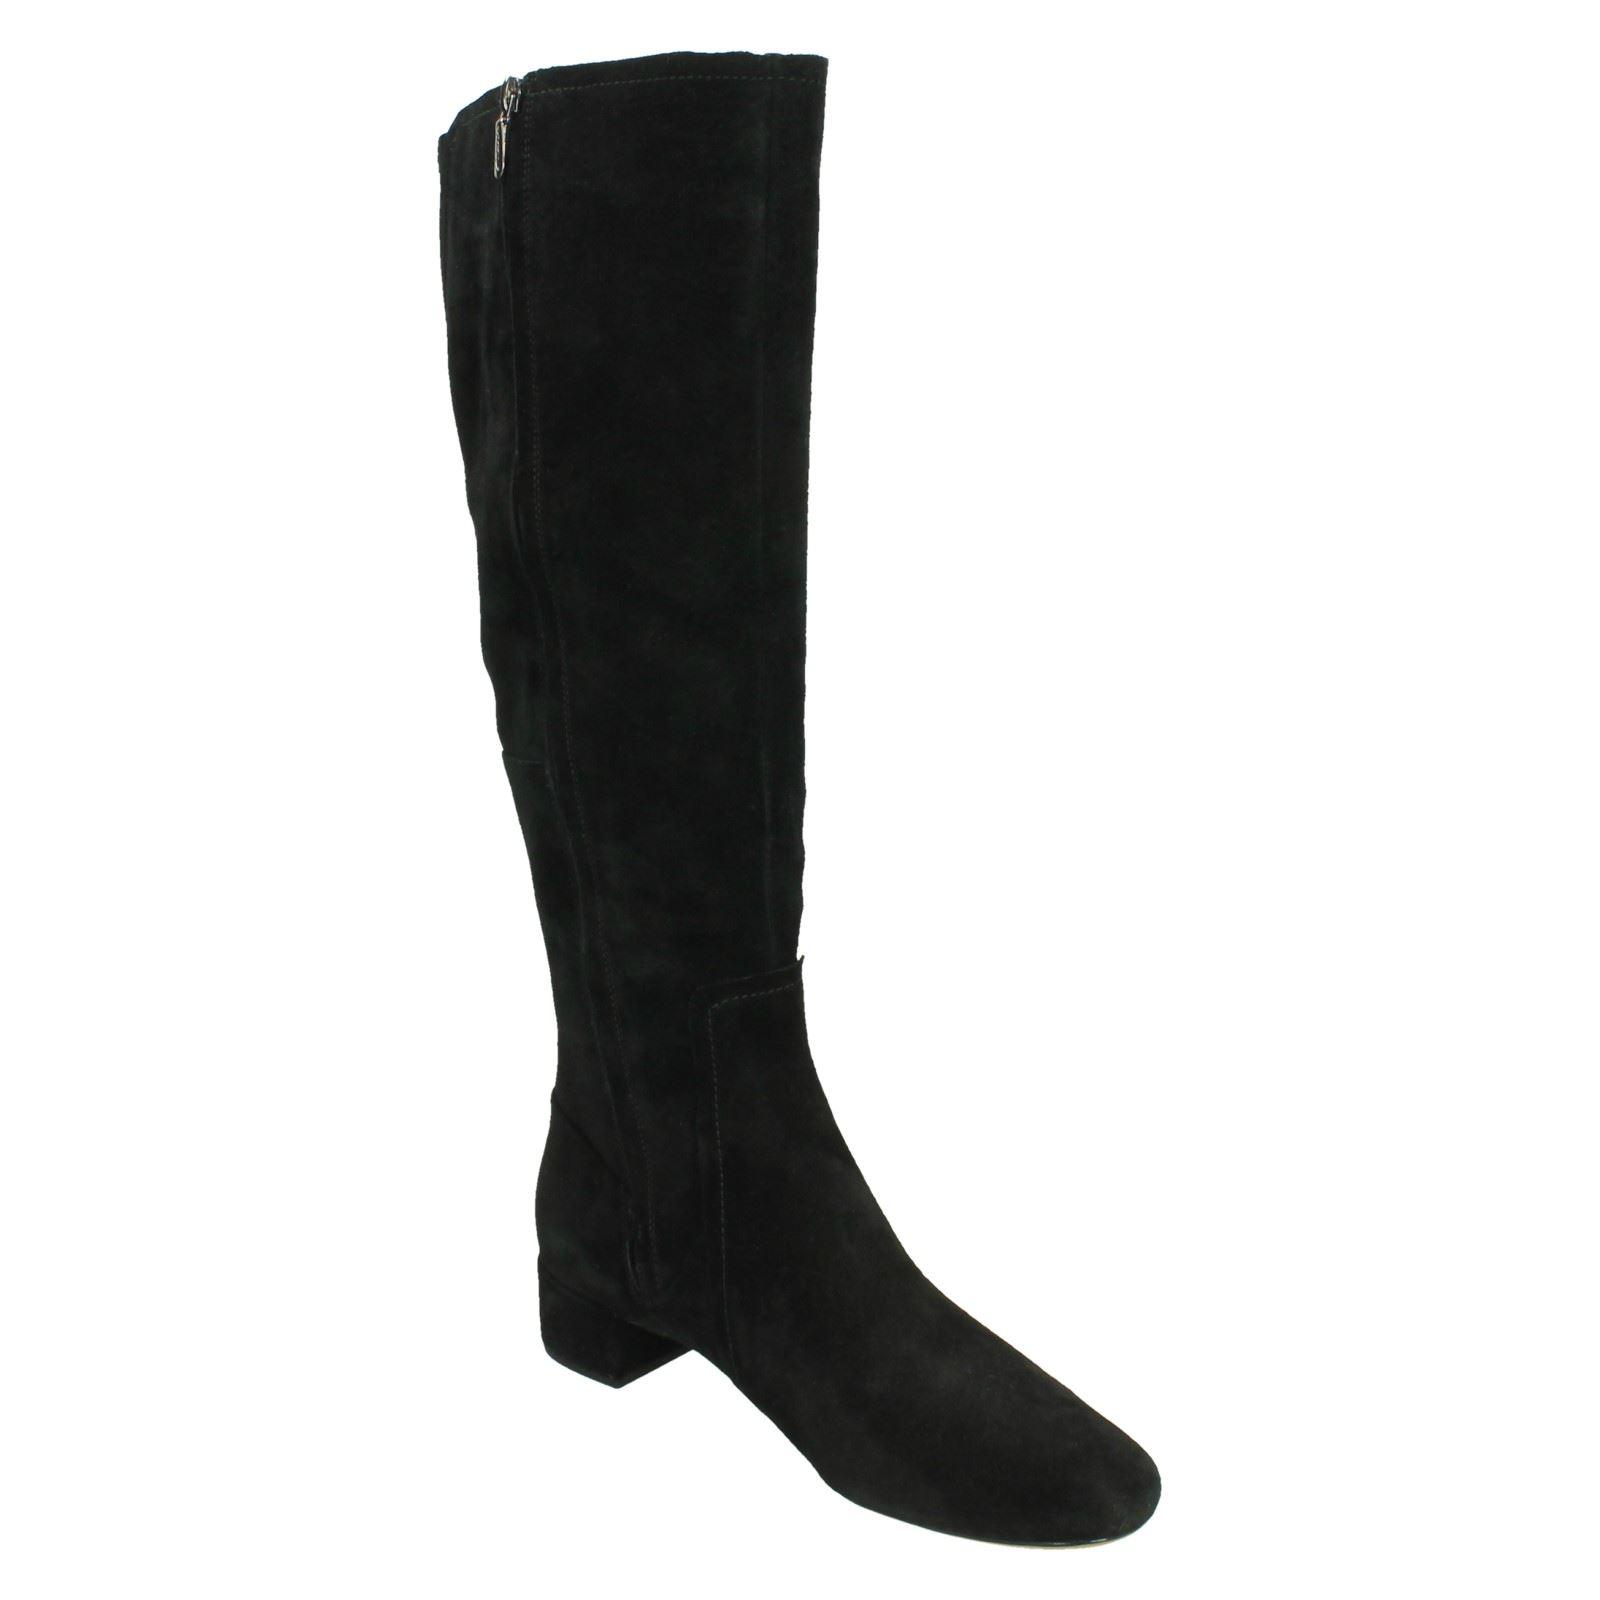 Ladies Clarks Knee High Boots /'Orabella Ava/'